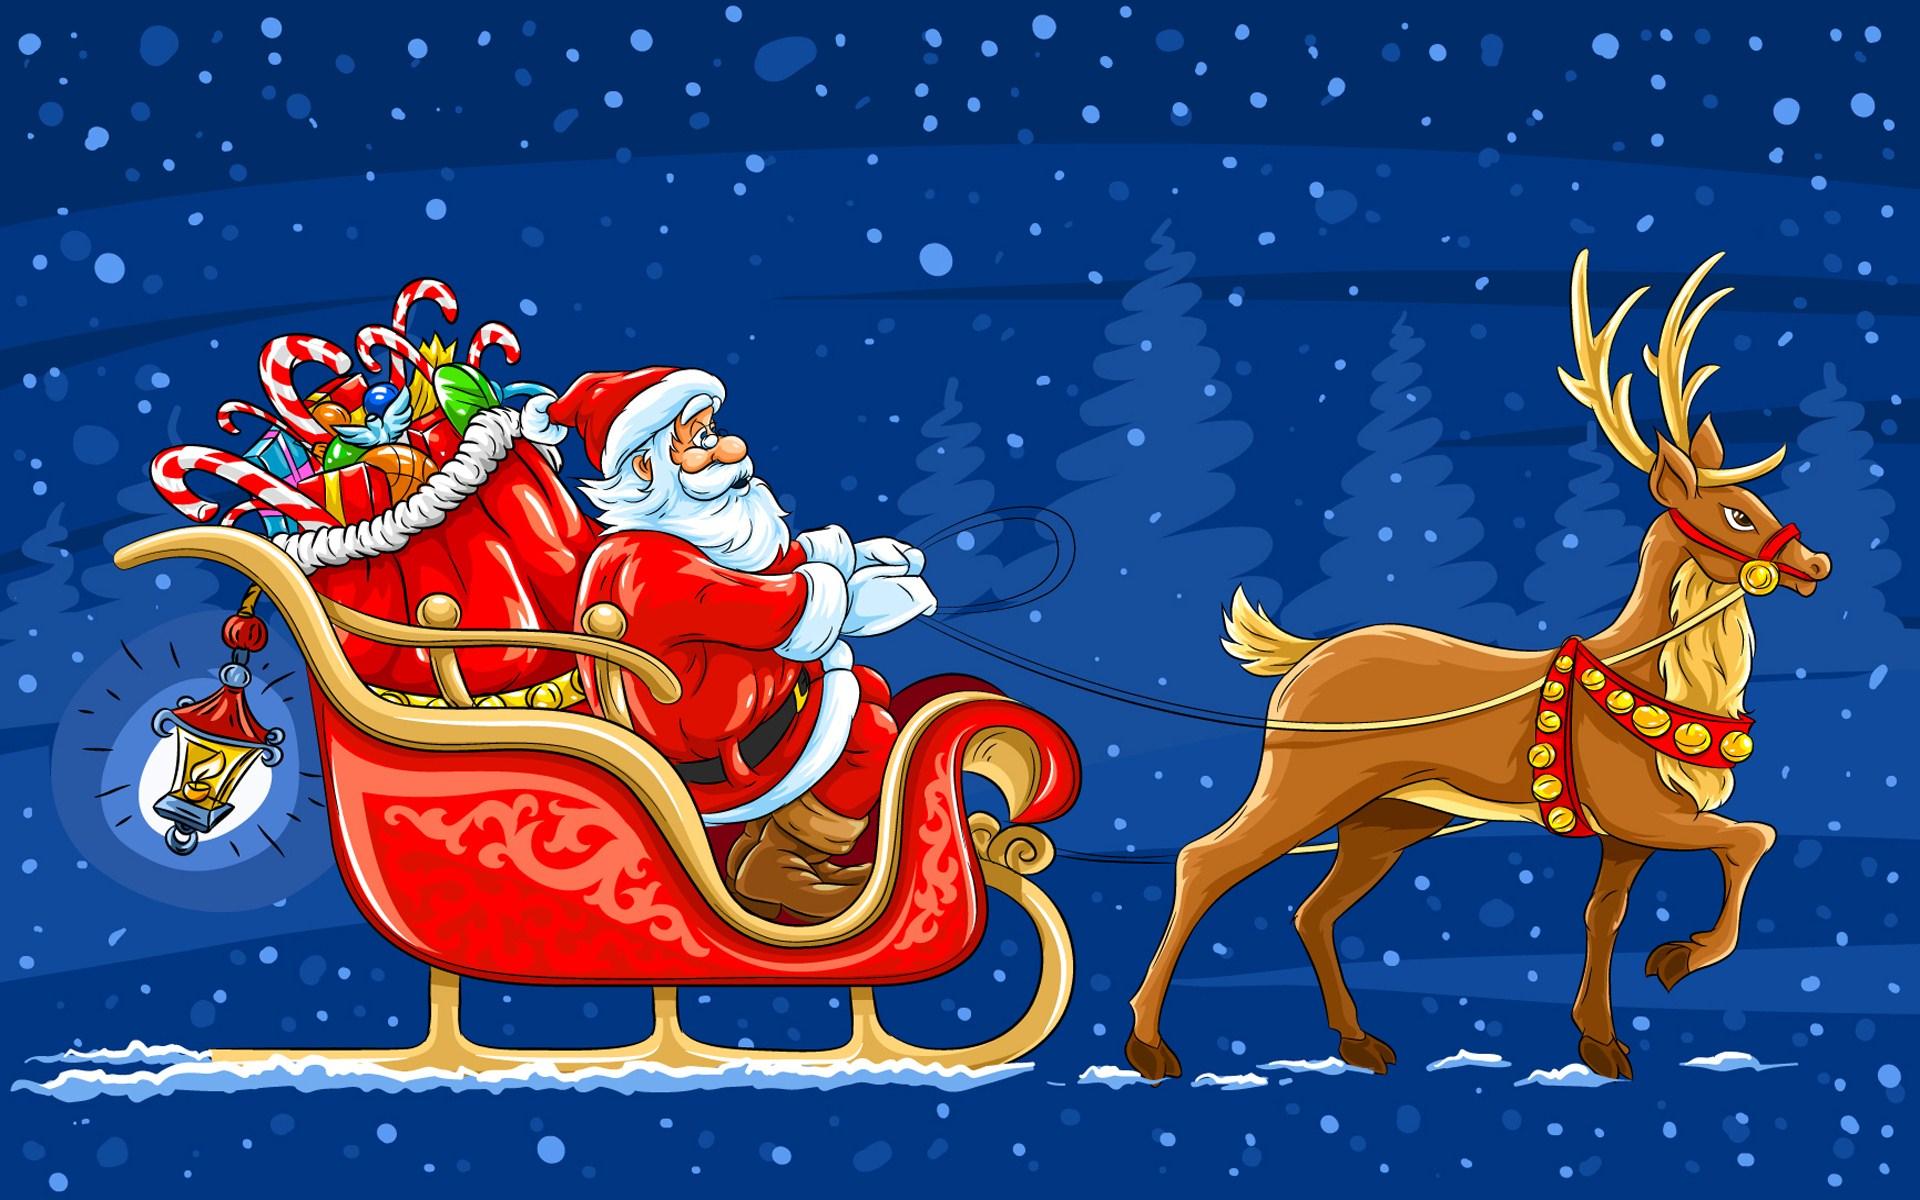 Free Animated Christmas Wallpaper for Desktop (3)